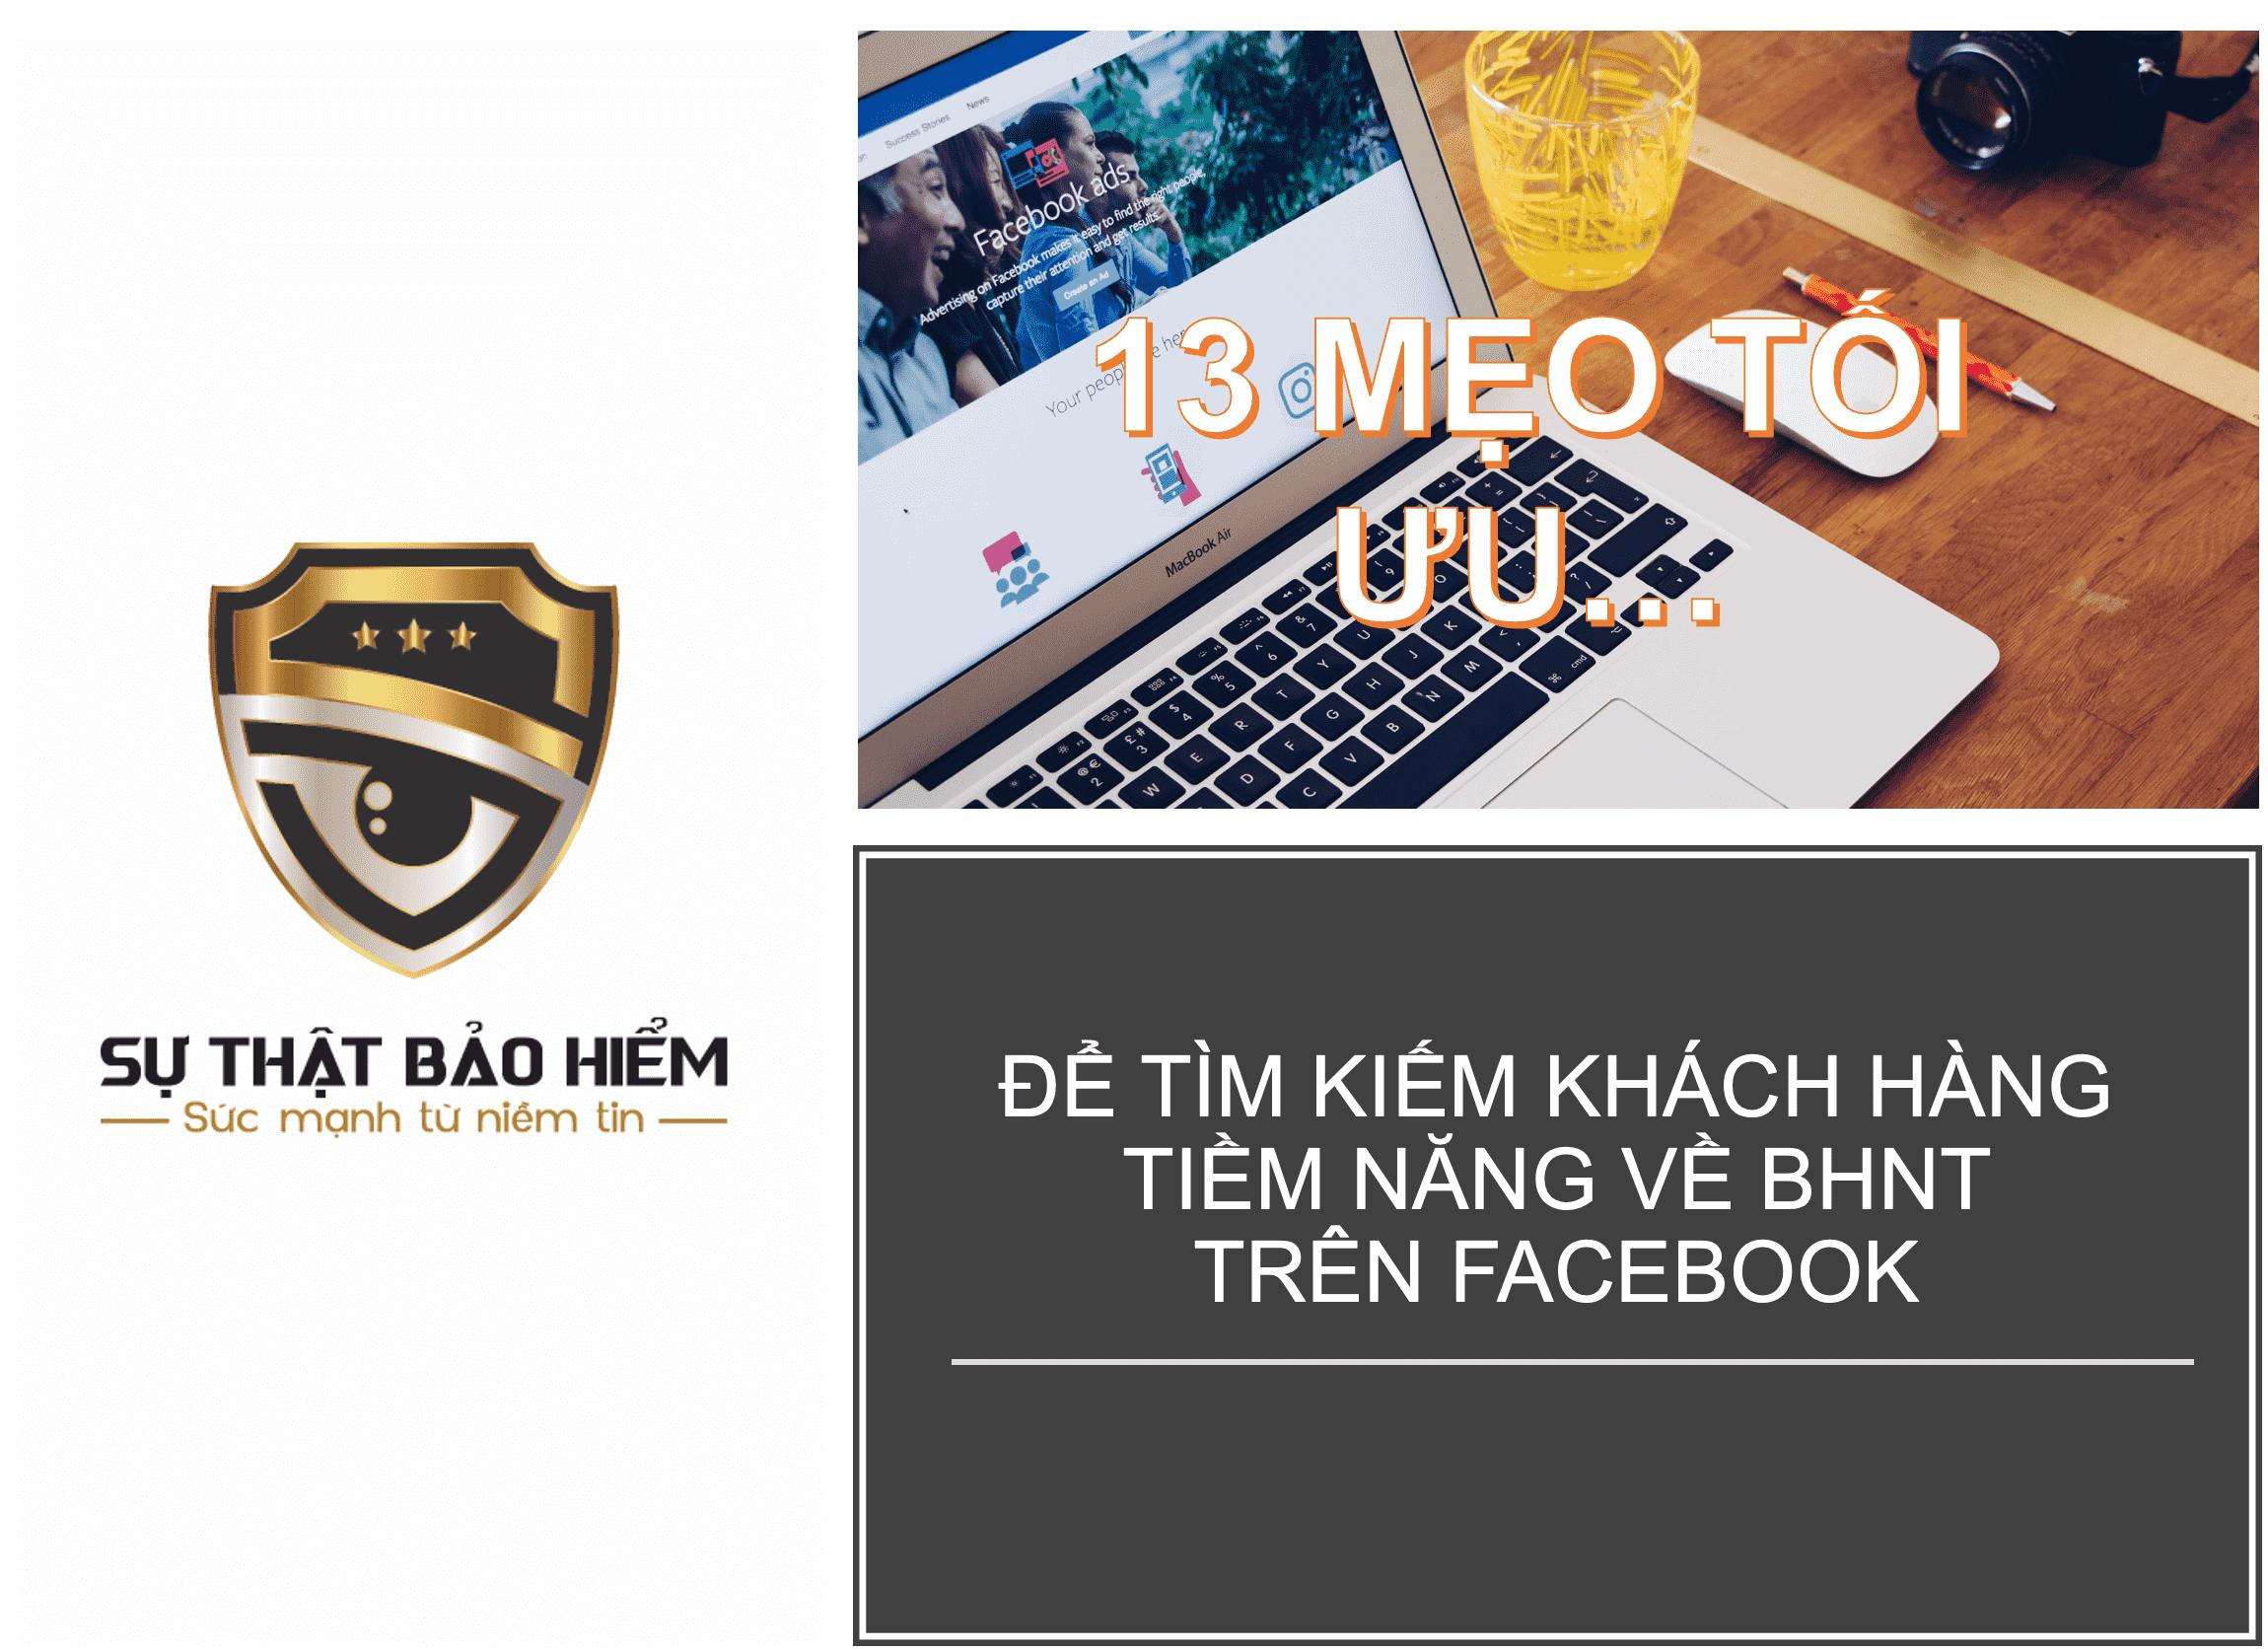 13 meo toi uu facebook de tim kiem khach hang bao hiem